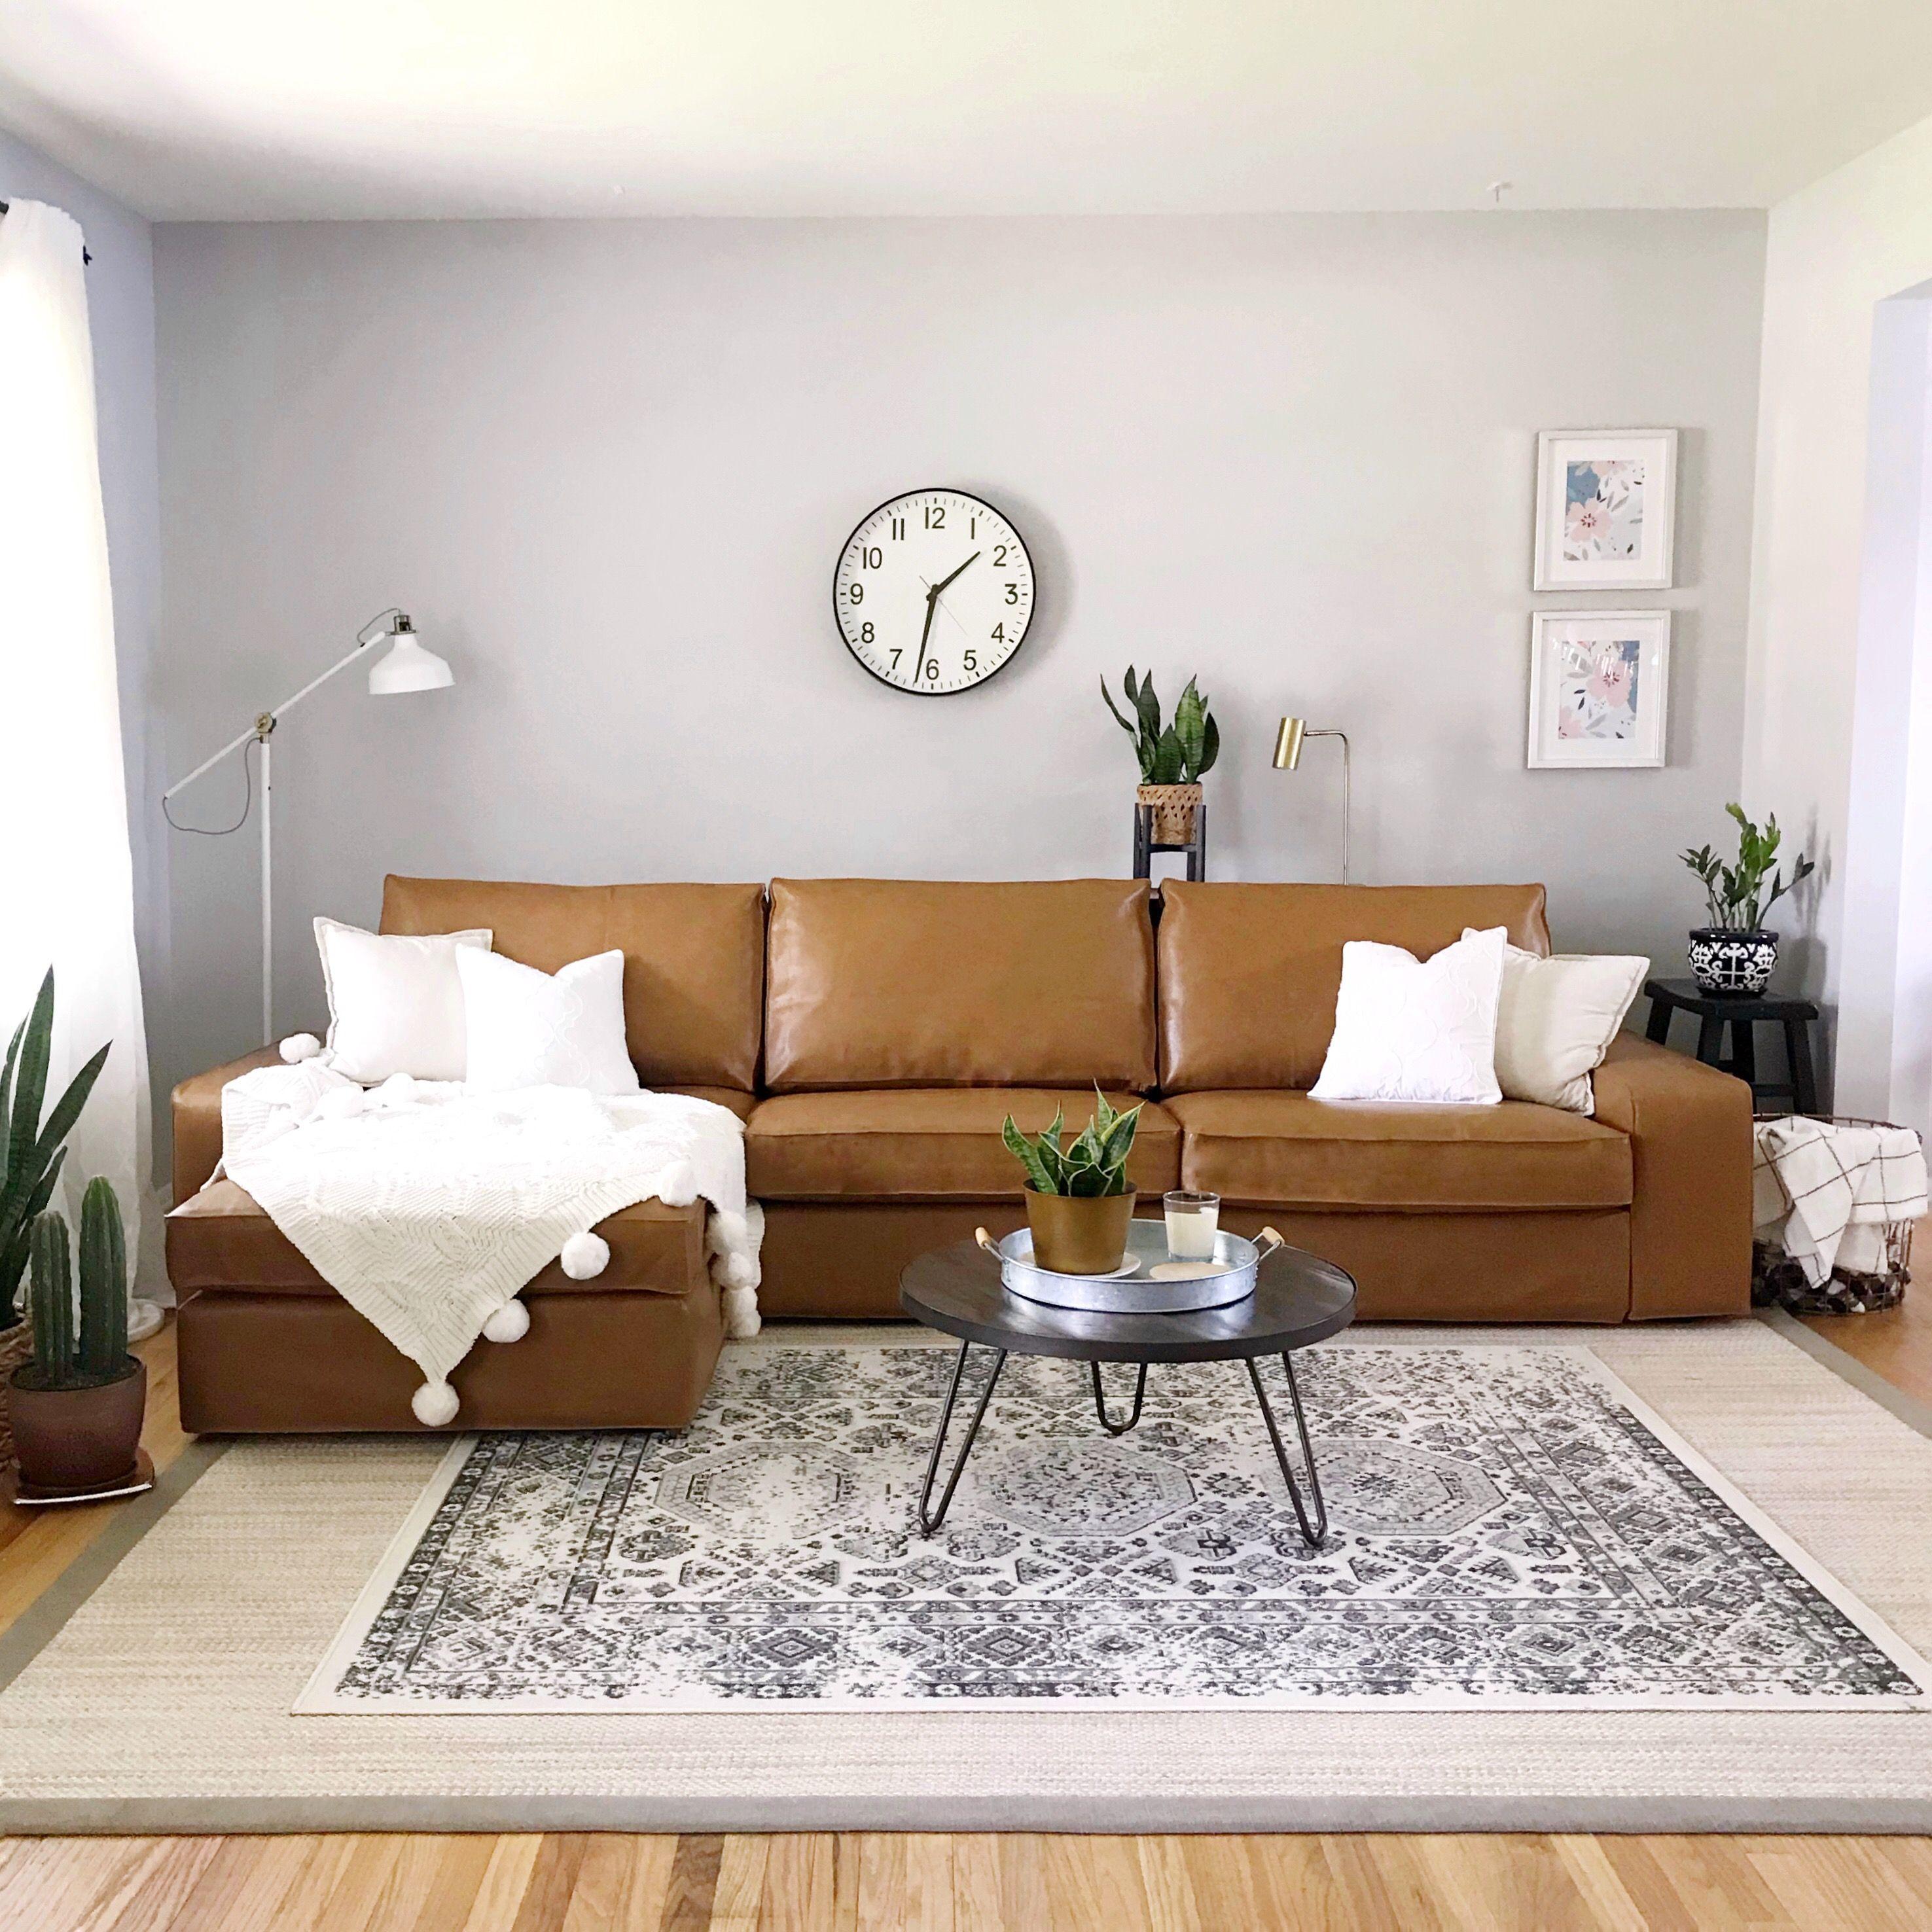 Swell Comfort Works Savannah Saddle Sofa Slipcovers For Ikea Beatyapartments Chair Design Images Beatyapartmentscom